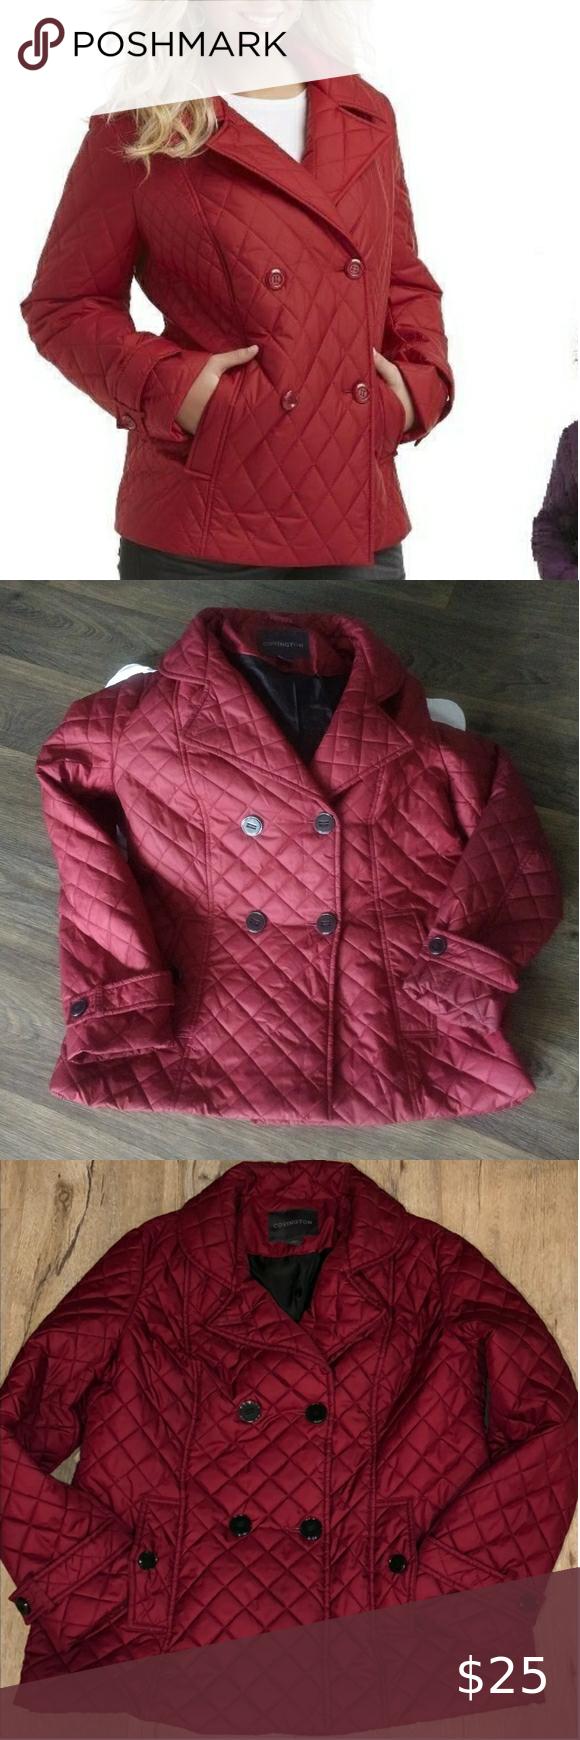 5 For 15 Covington Burgundy Puffer Jacket Puffer Jackets Jackets For Women Jackets [ 1740 x 580 Pixel ]